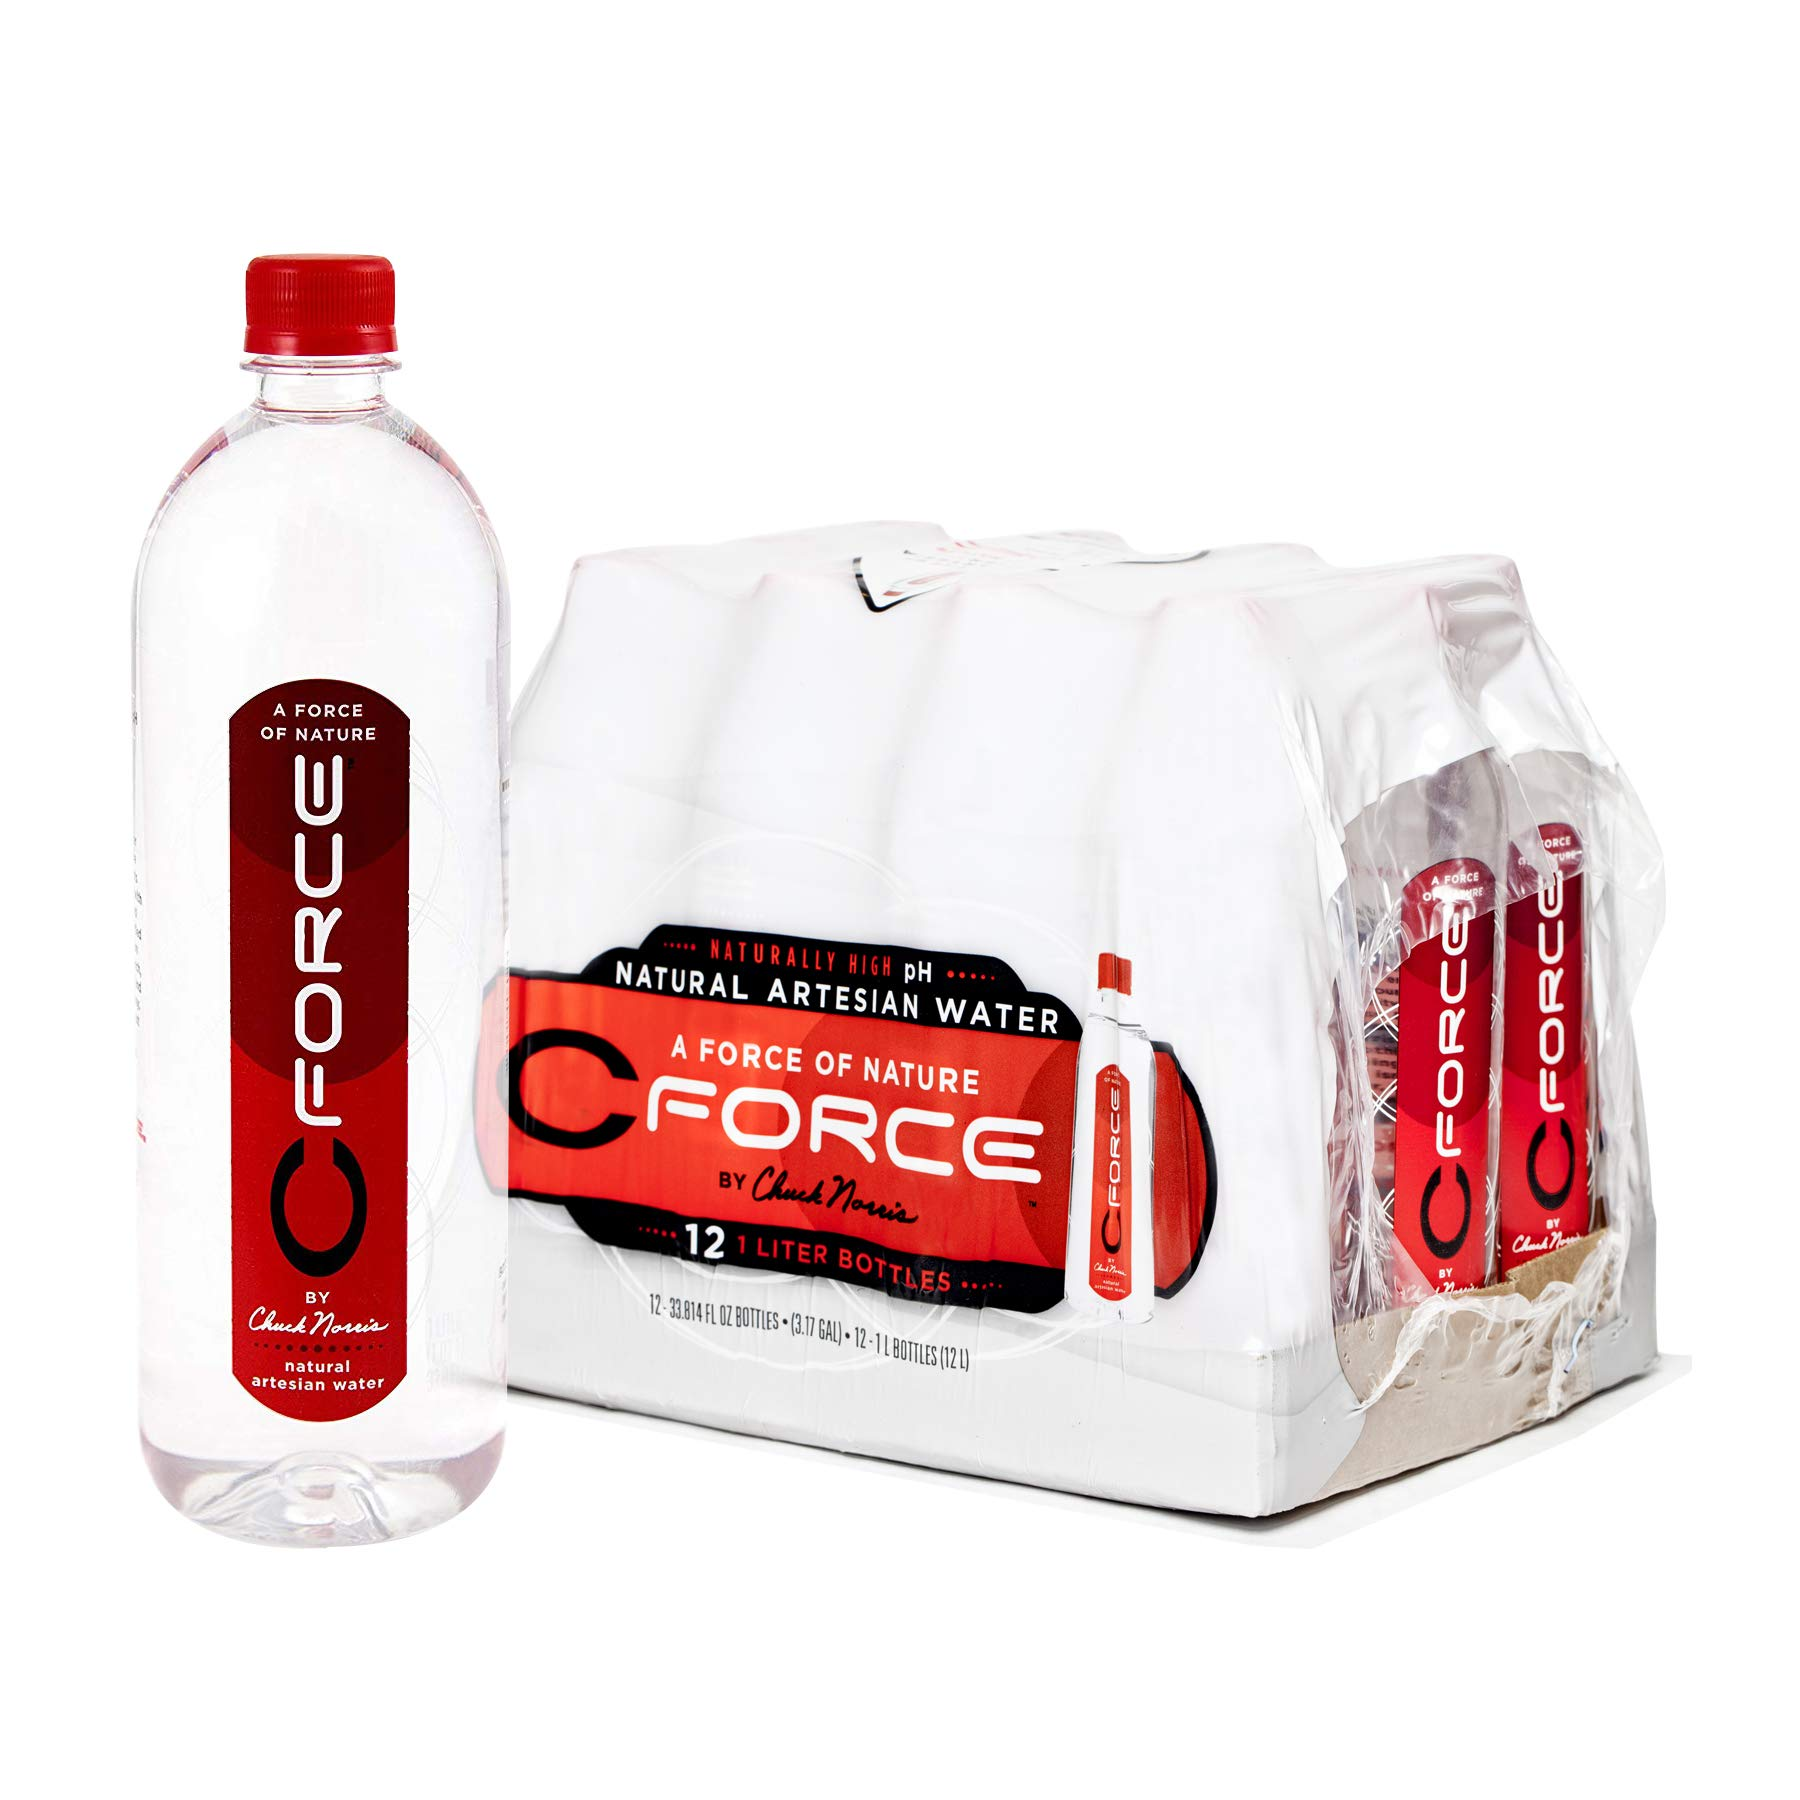 CForce Natural Artesian Bottled Water, Naturally High pH + Alkaline, 1 Liter (33.8oz), (12 CT, Pack of 4) by CFORCE